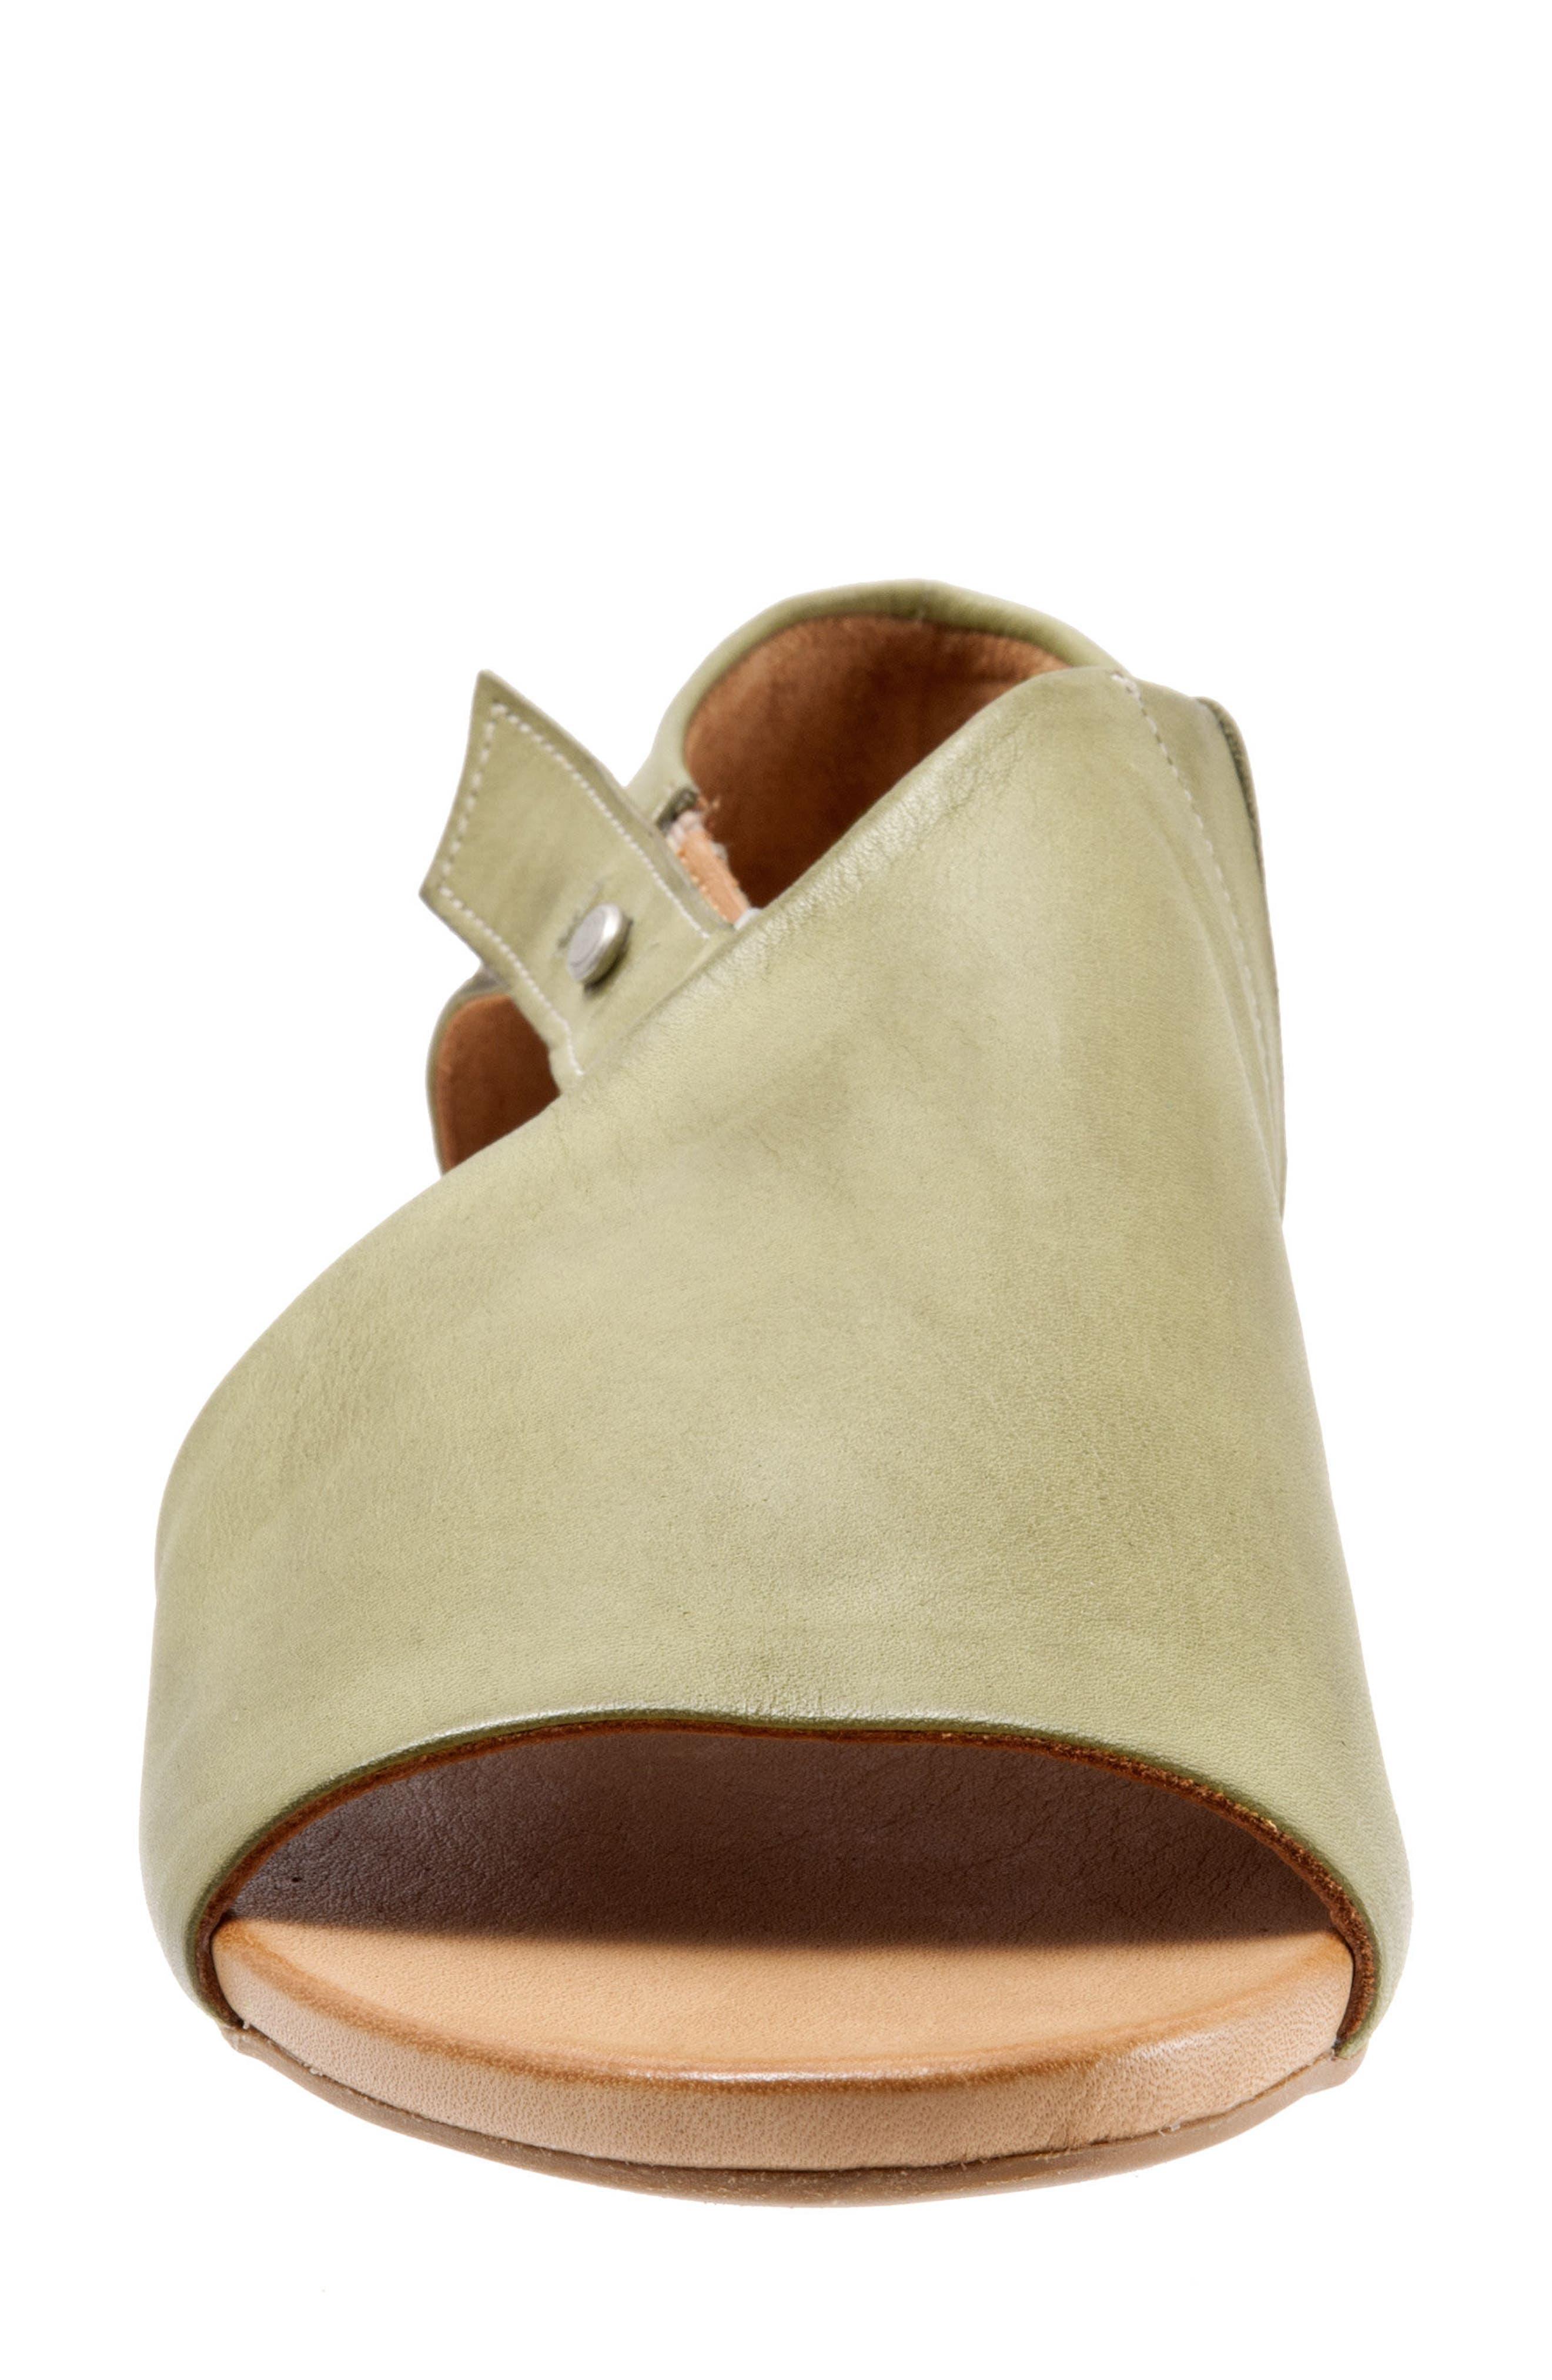 Kale Sandal,                             Alternate thumbnail 4, color,                             Moss Leather